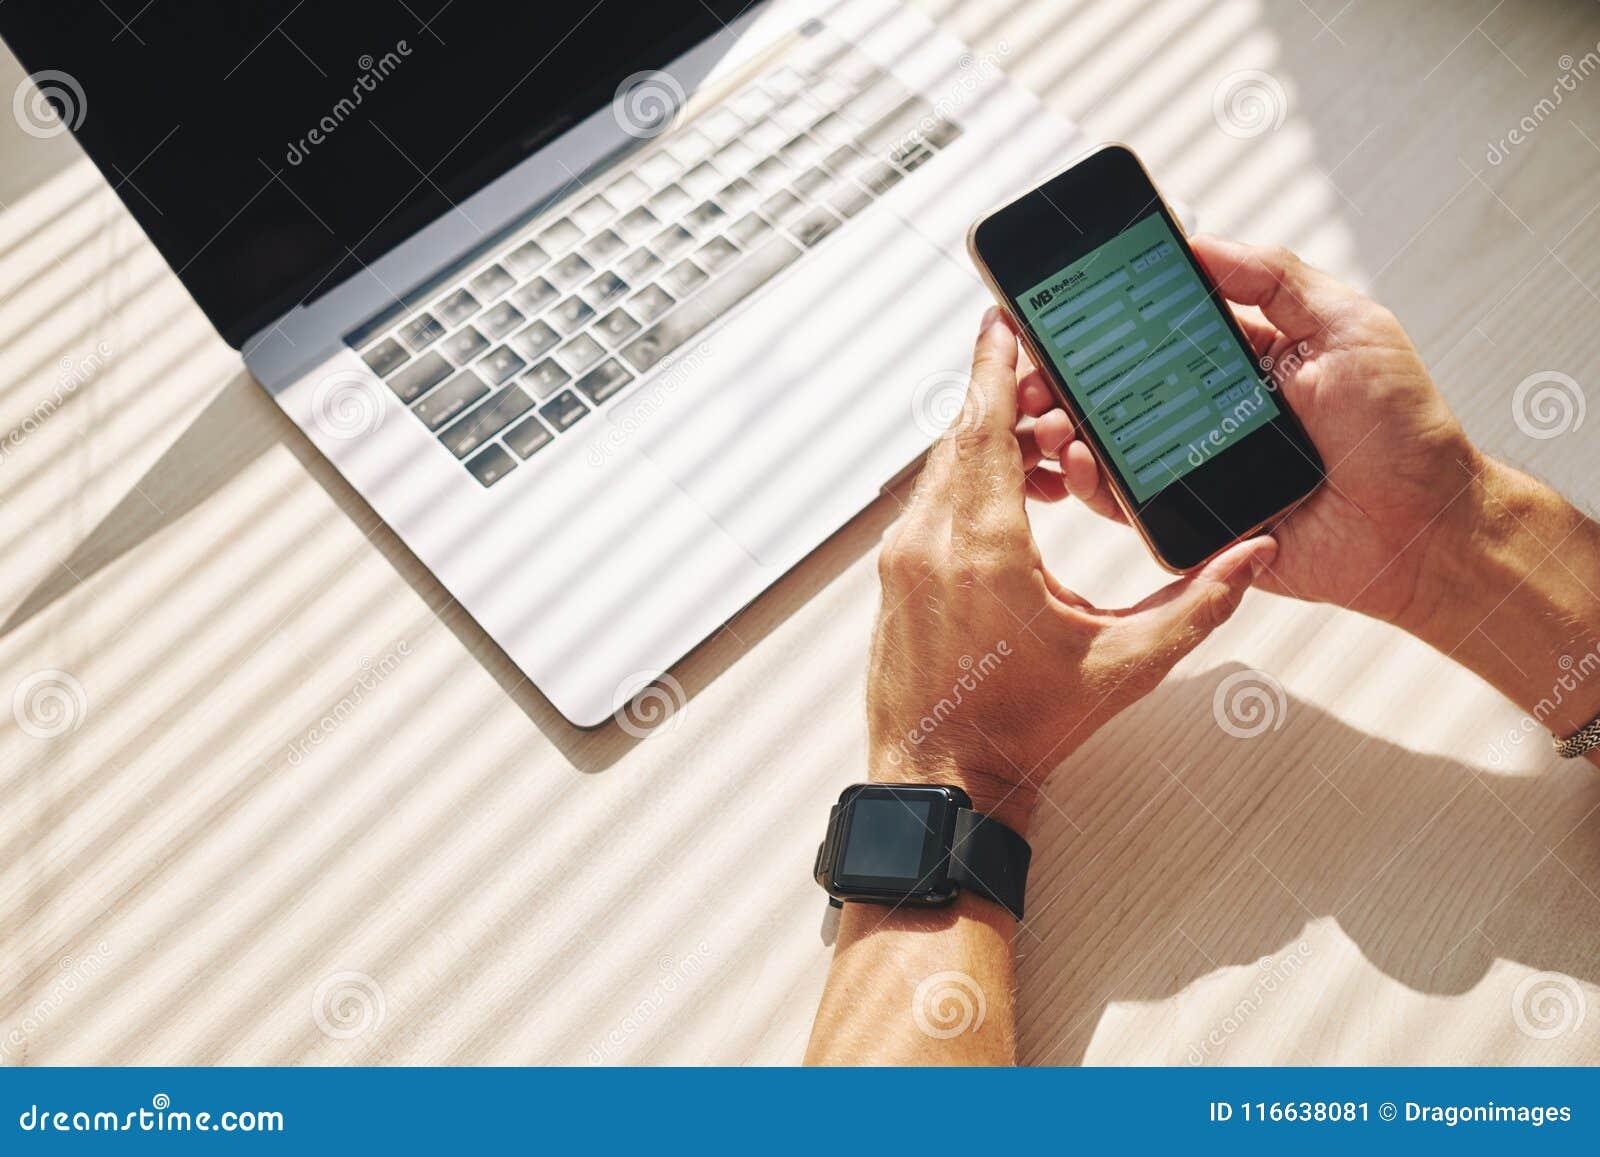 Online bank in phone